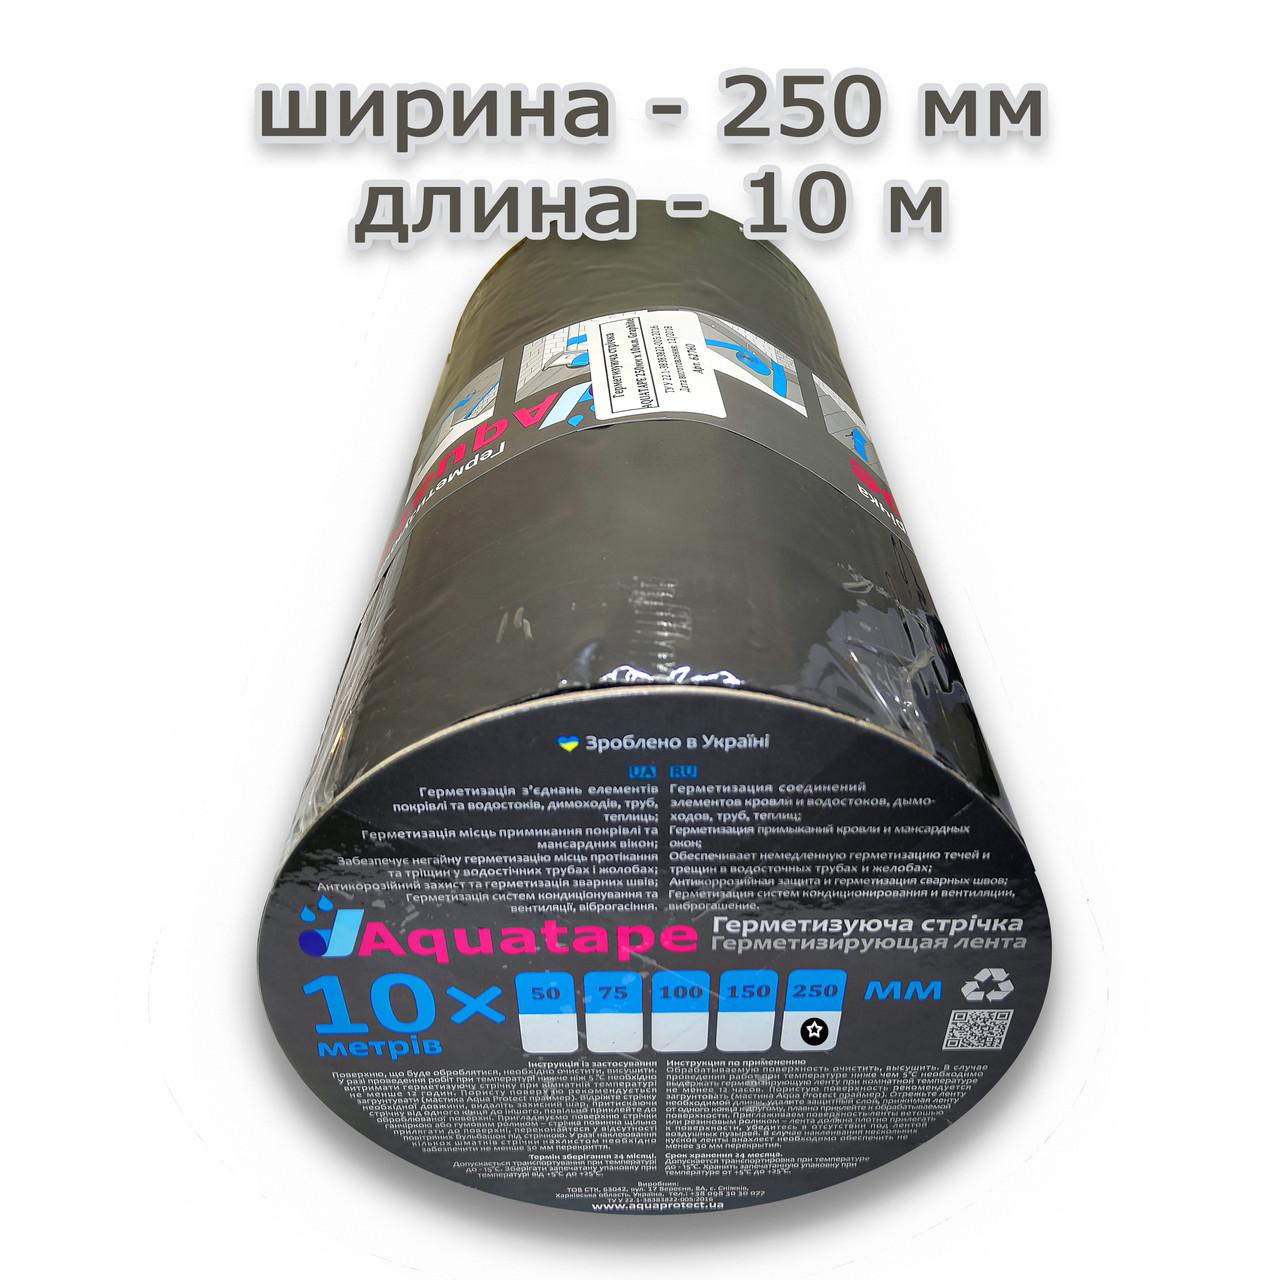 Битумная Лента 250 мм х 10 м ALU+Graphite RAL 7012